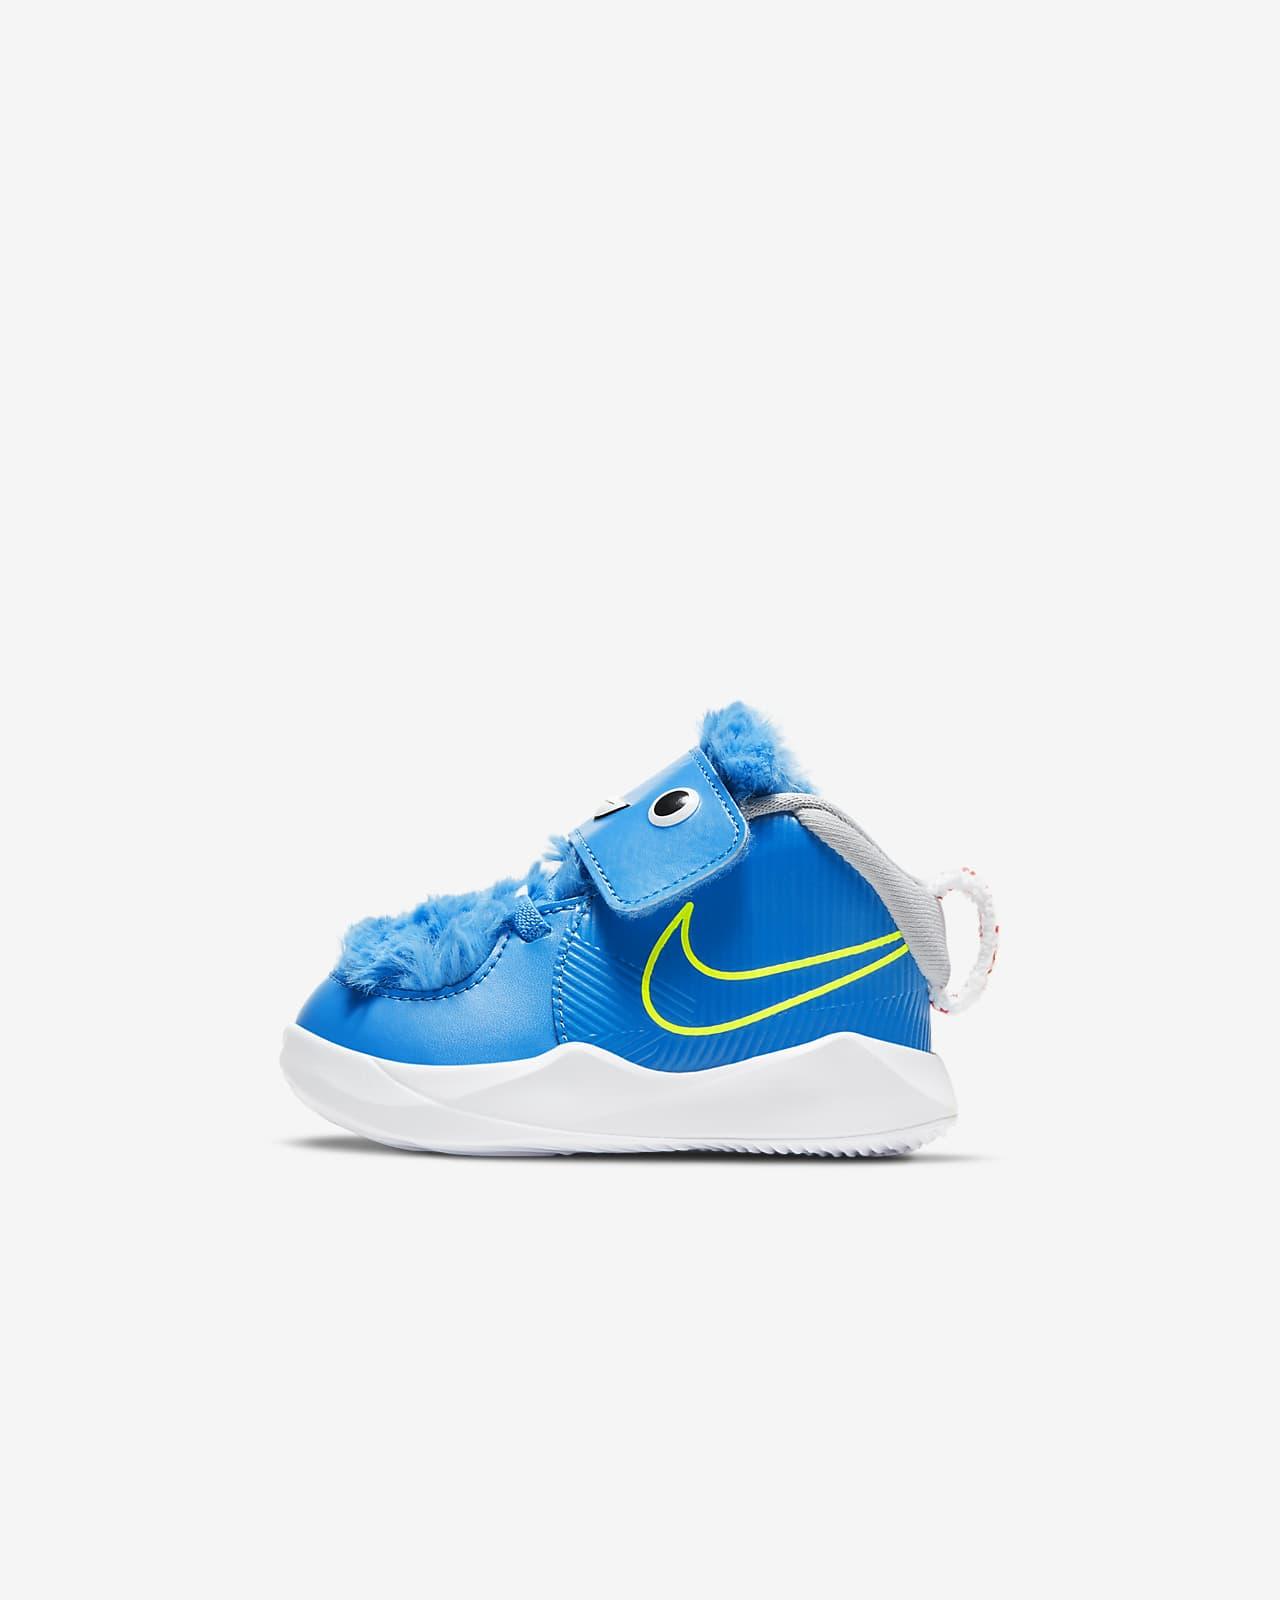 Nike Team Hustle D 9 Lil Baby/Toddler Shoe